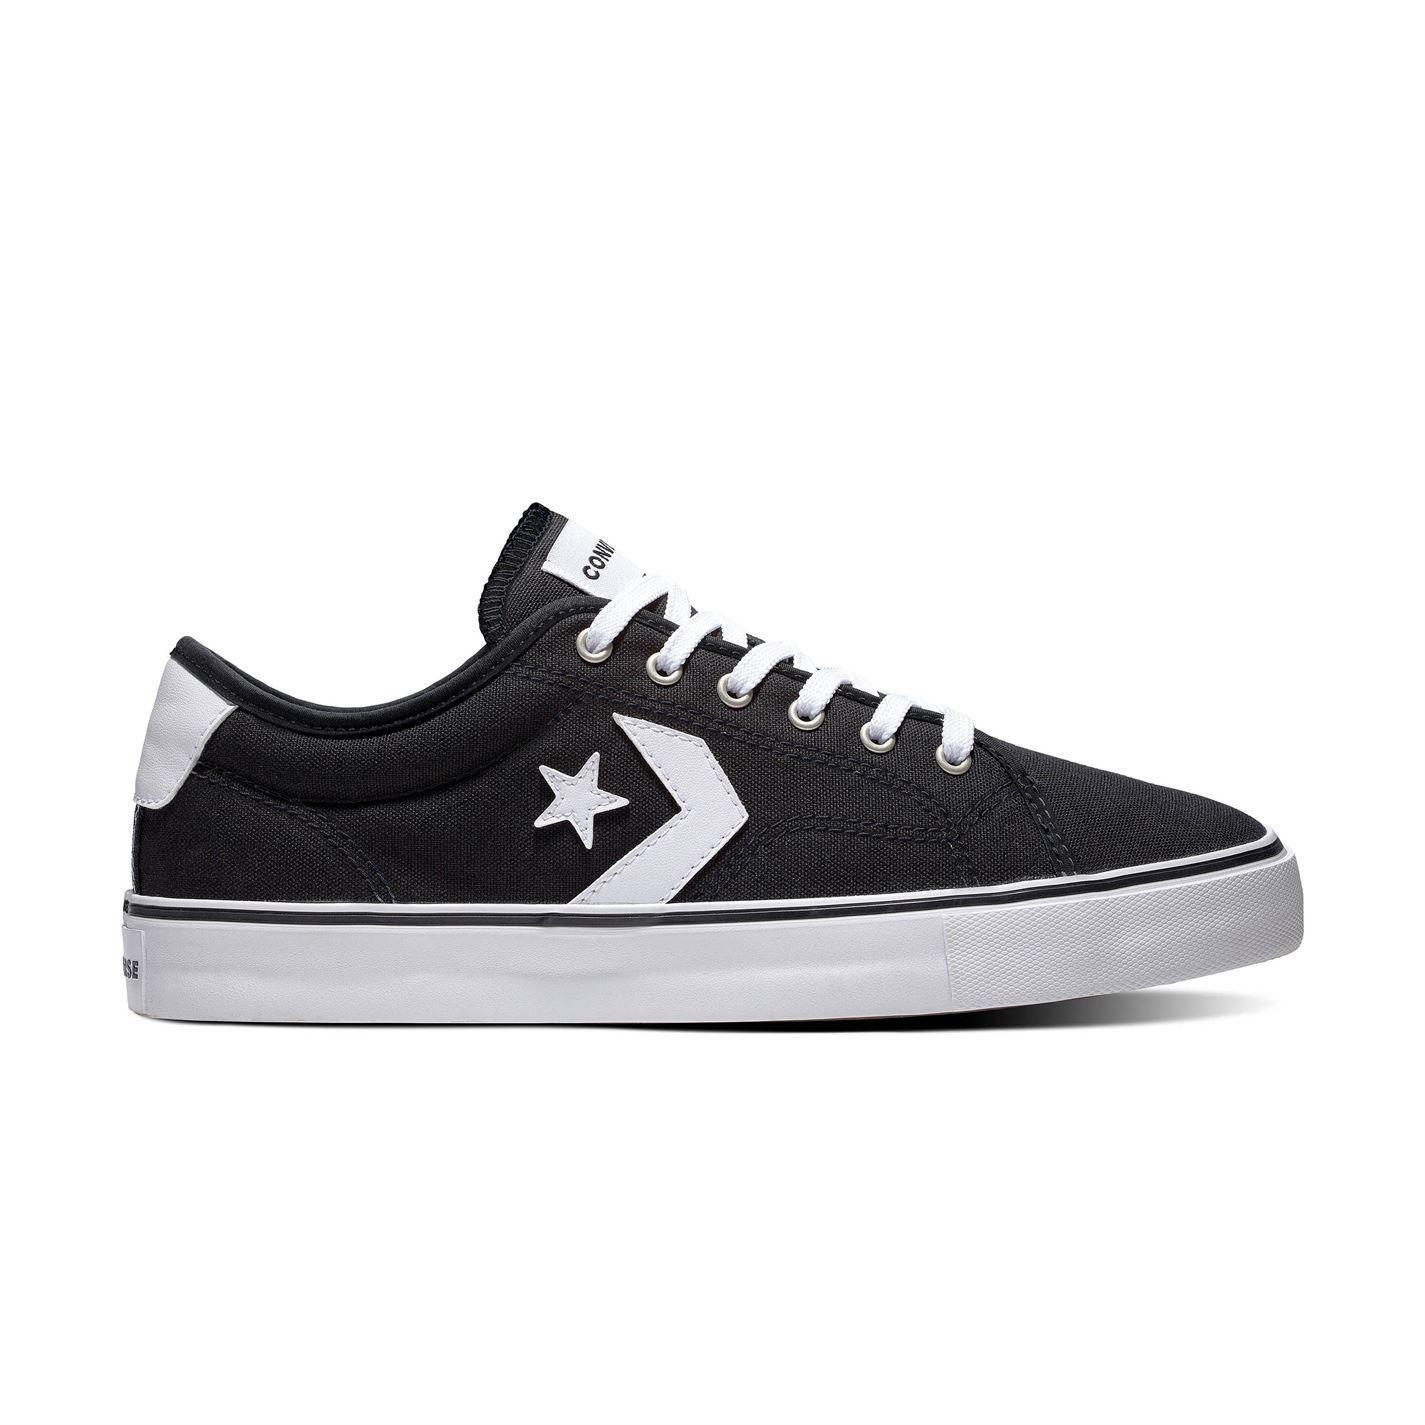 Converse-Ox-REPLAY-Baskets-Pour-Homme-Chaussures-De-Loisirs-Chaussures-Baskets miniature 9